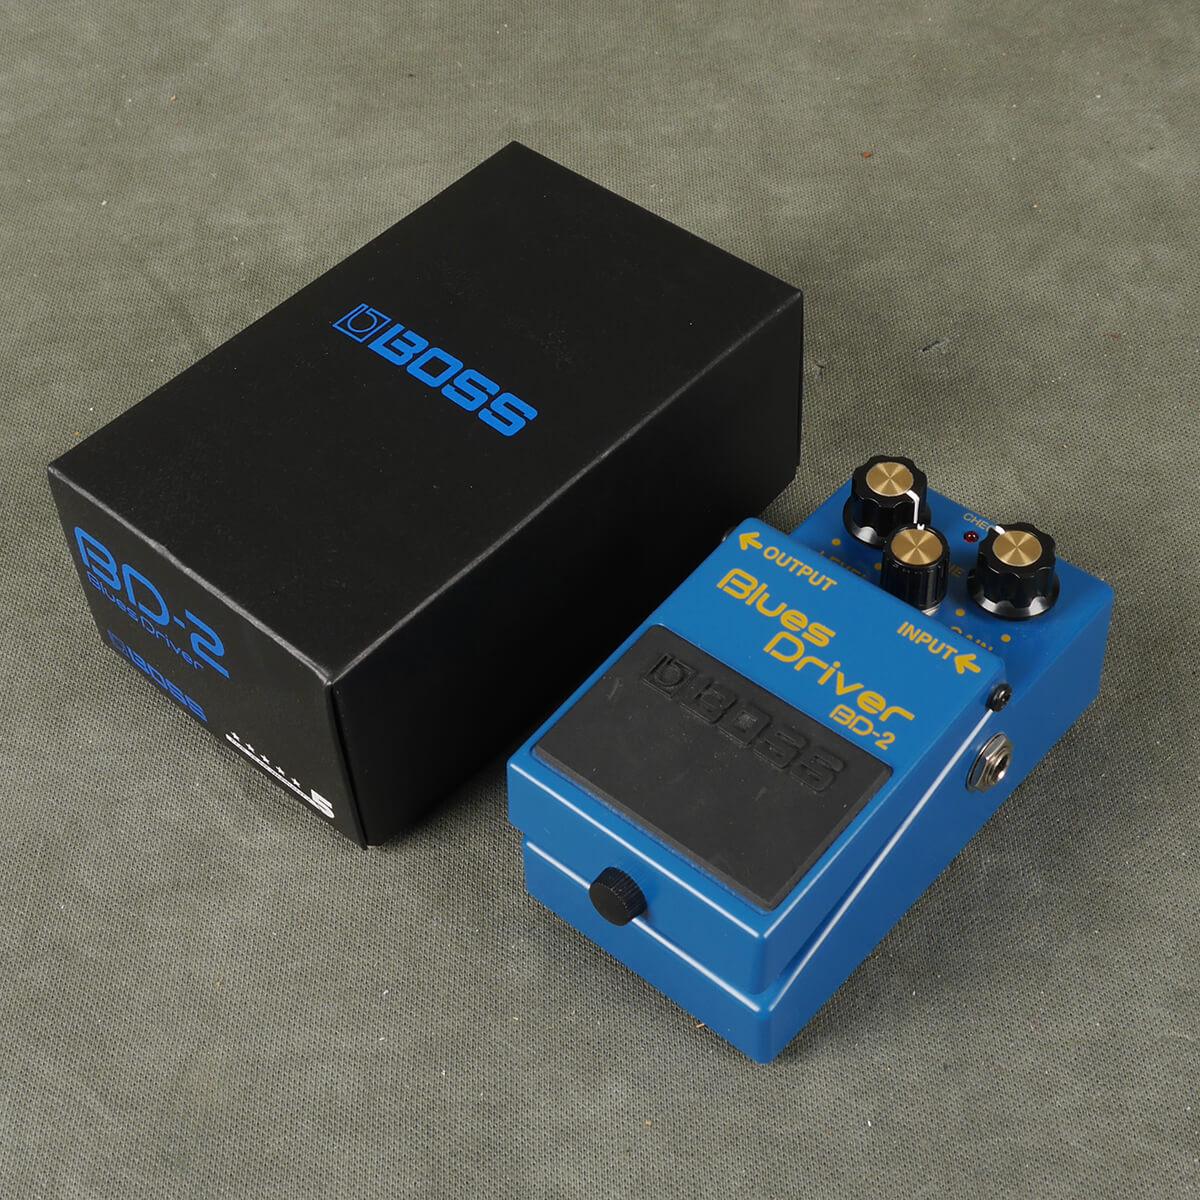 Boss BD-2 Blues Driver FX Pedal w/Box - 2nd Hand